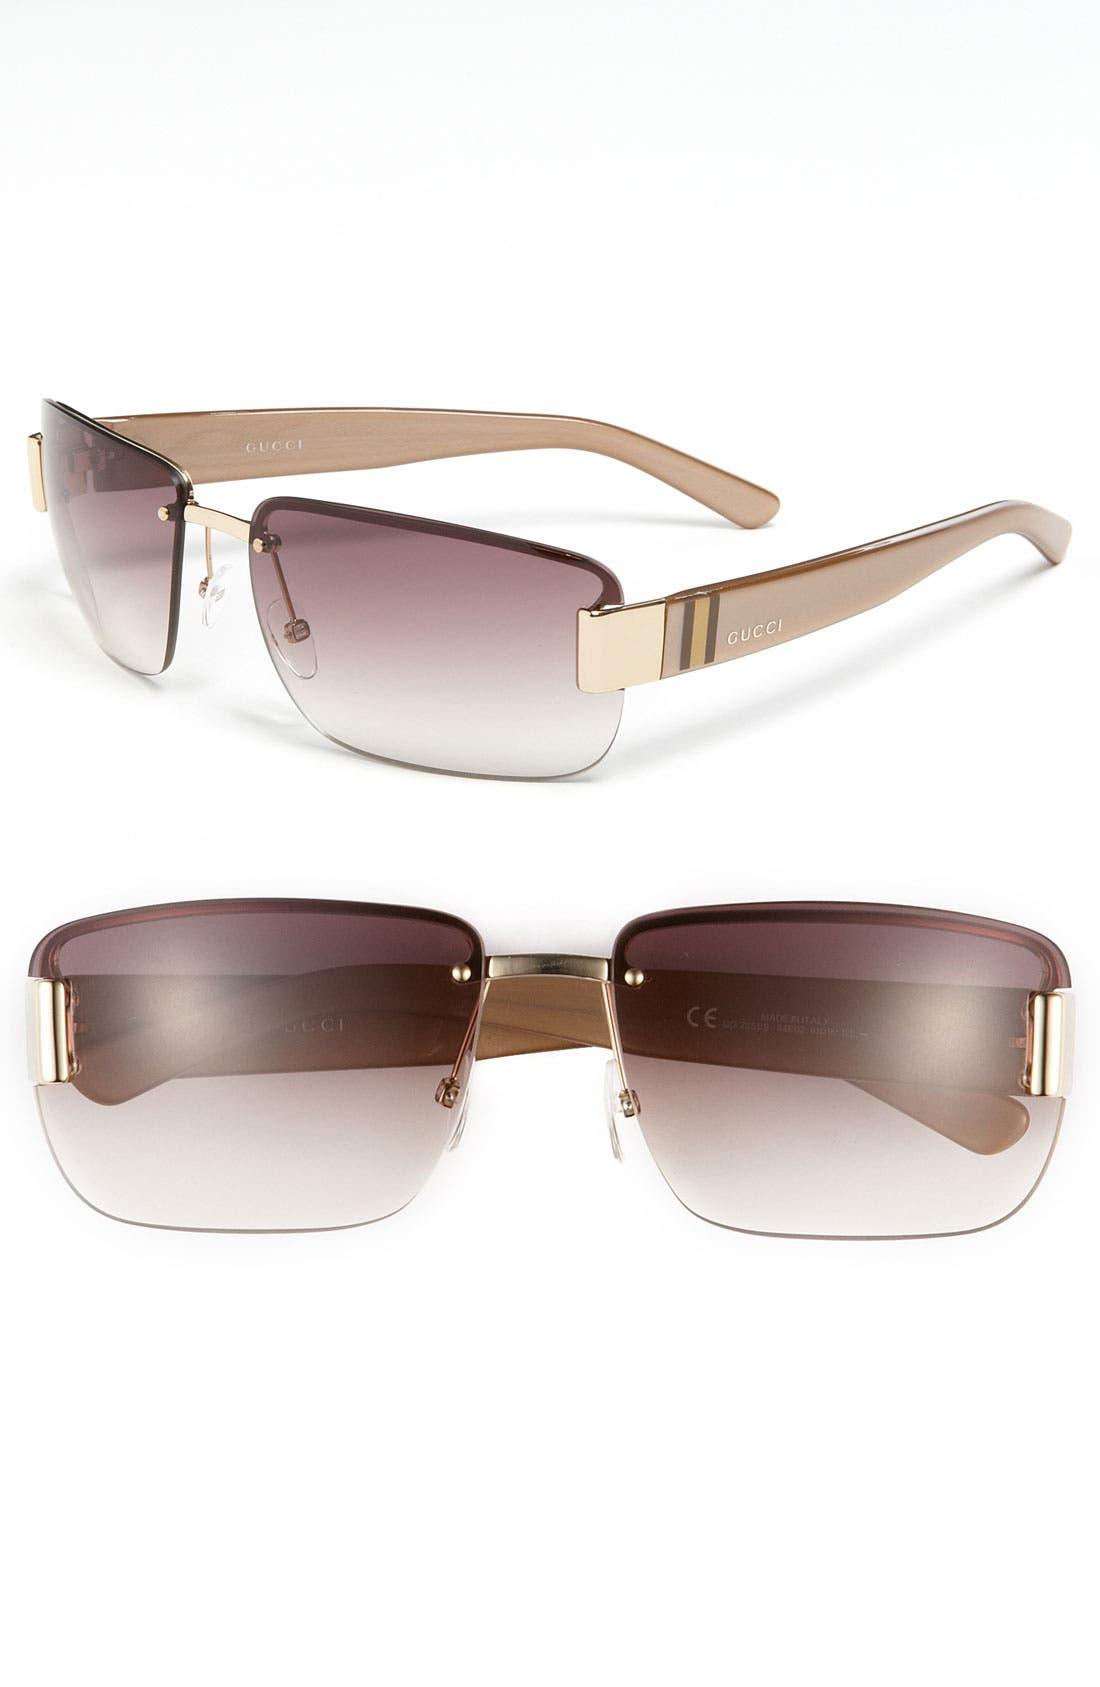 Main Image - Gucci 61mm Rimless Sunglasses